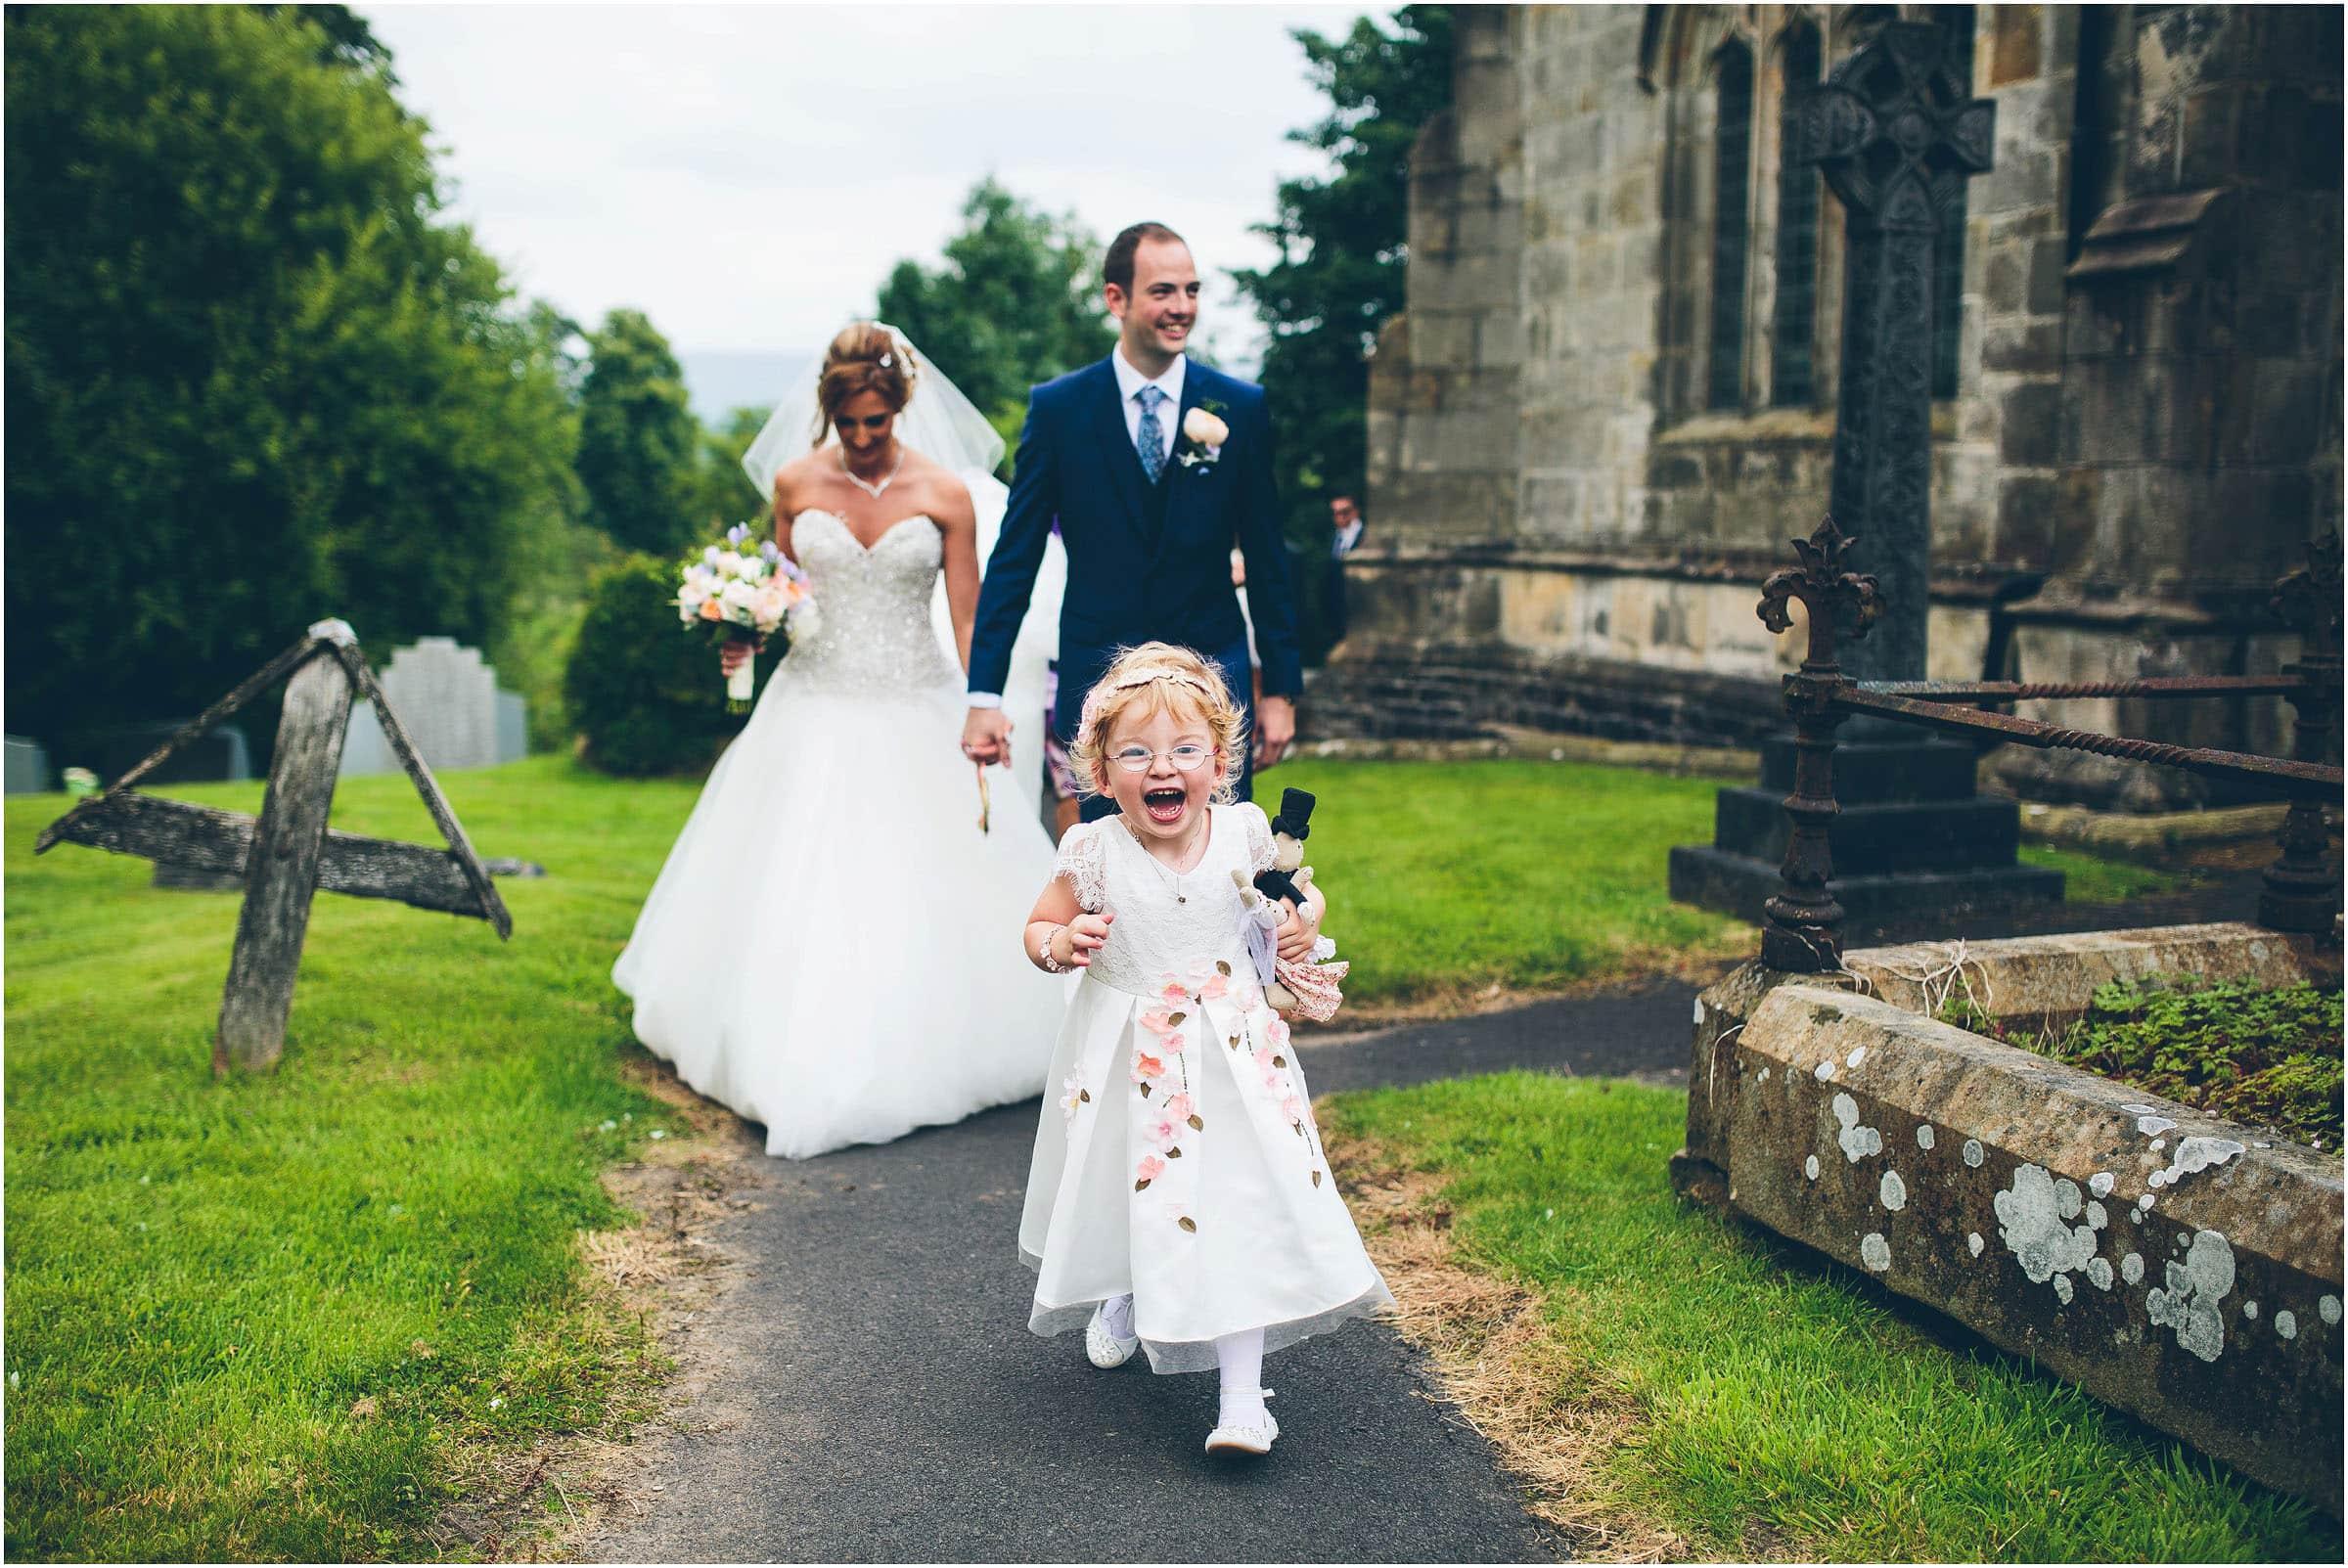 Mitton_Hall_Wedding_Photography_0067